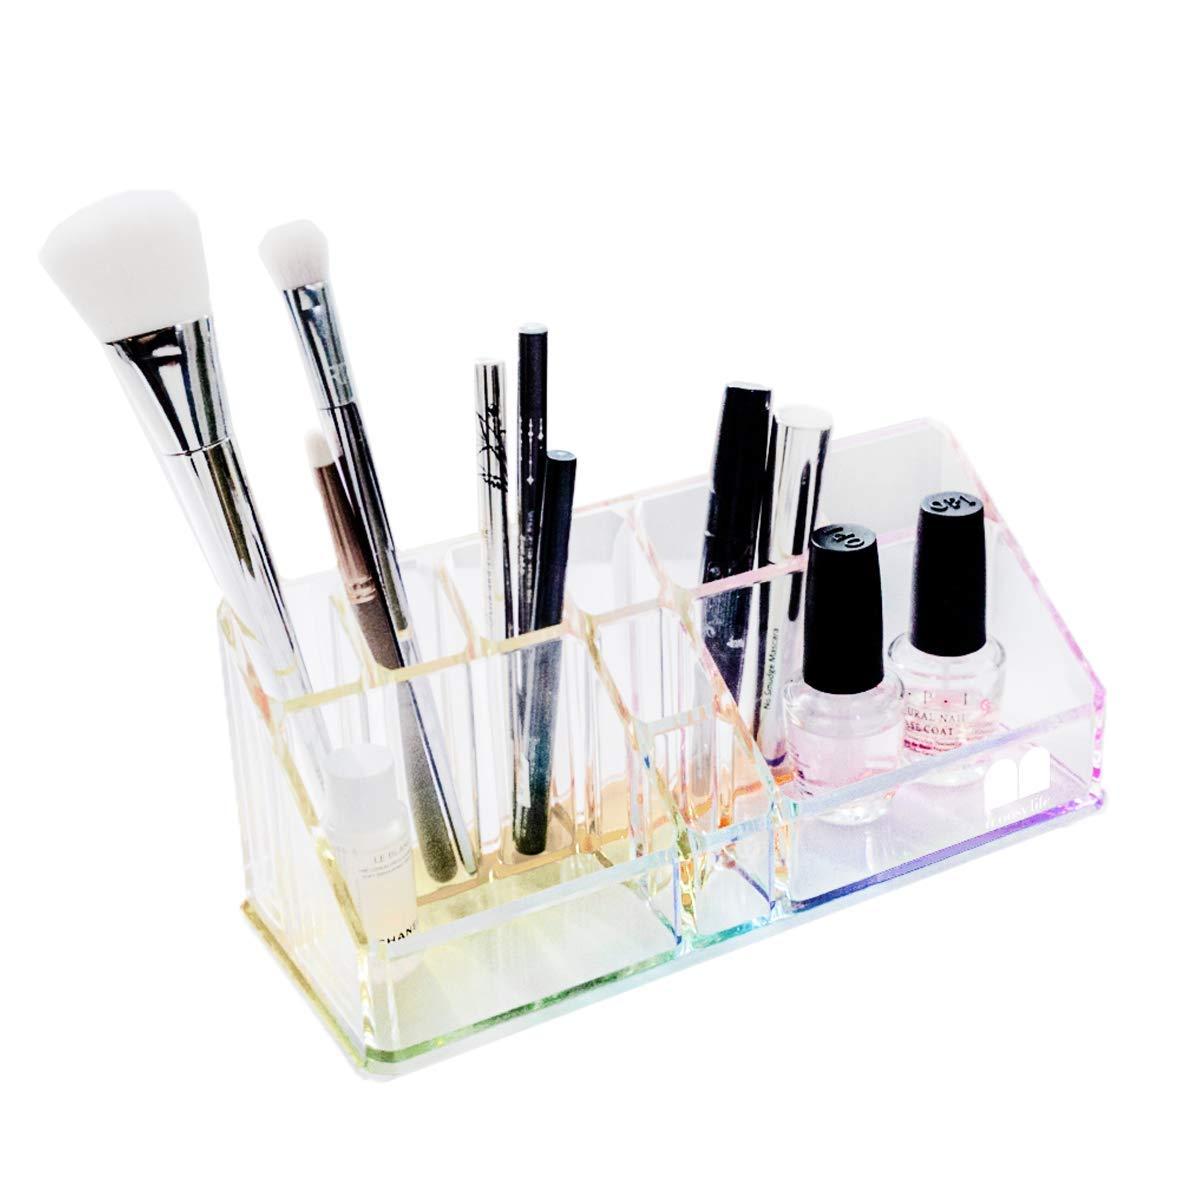 Moosy Life Acrylic Makeup and Office Desktop Organizer Rainbow